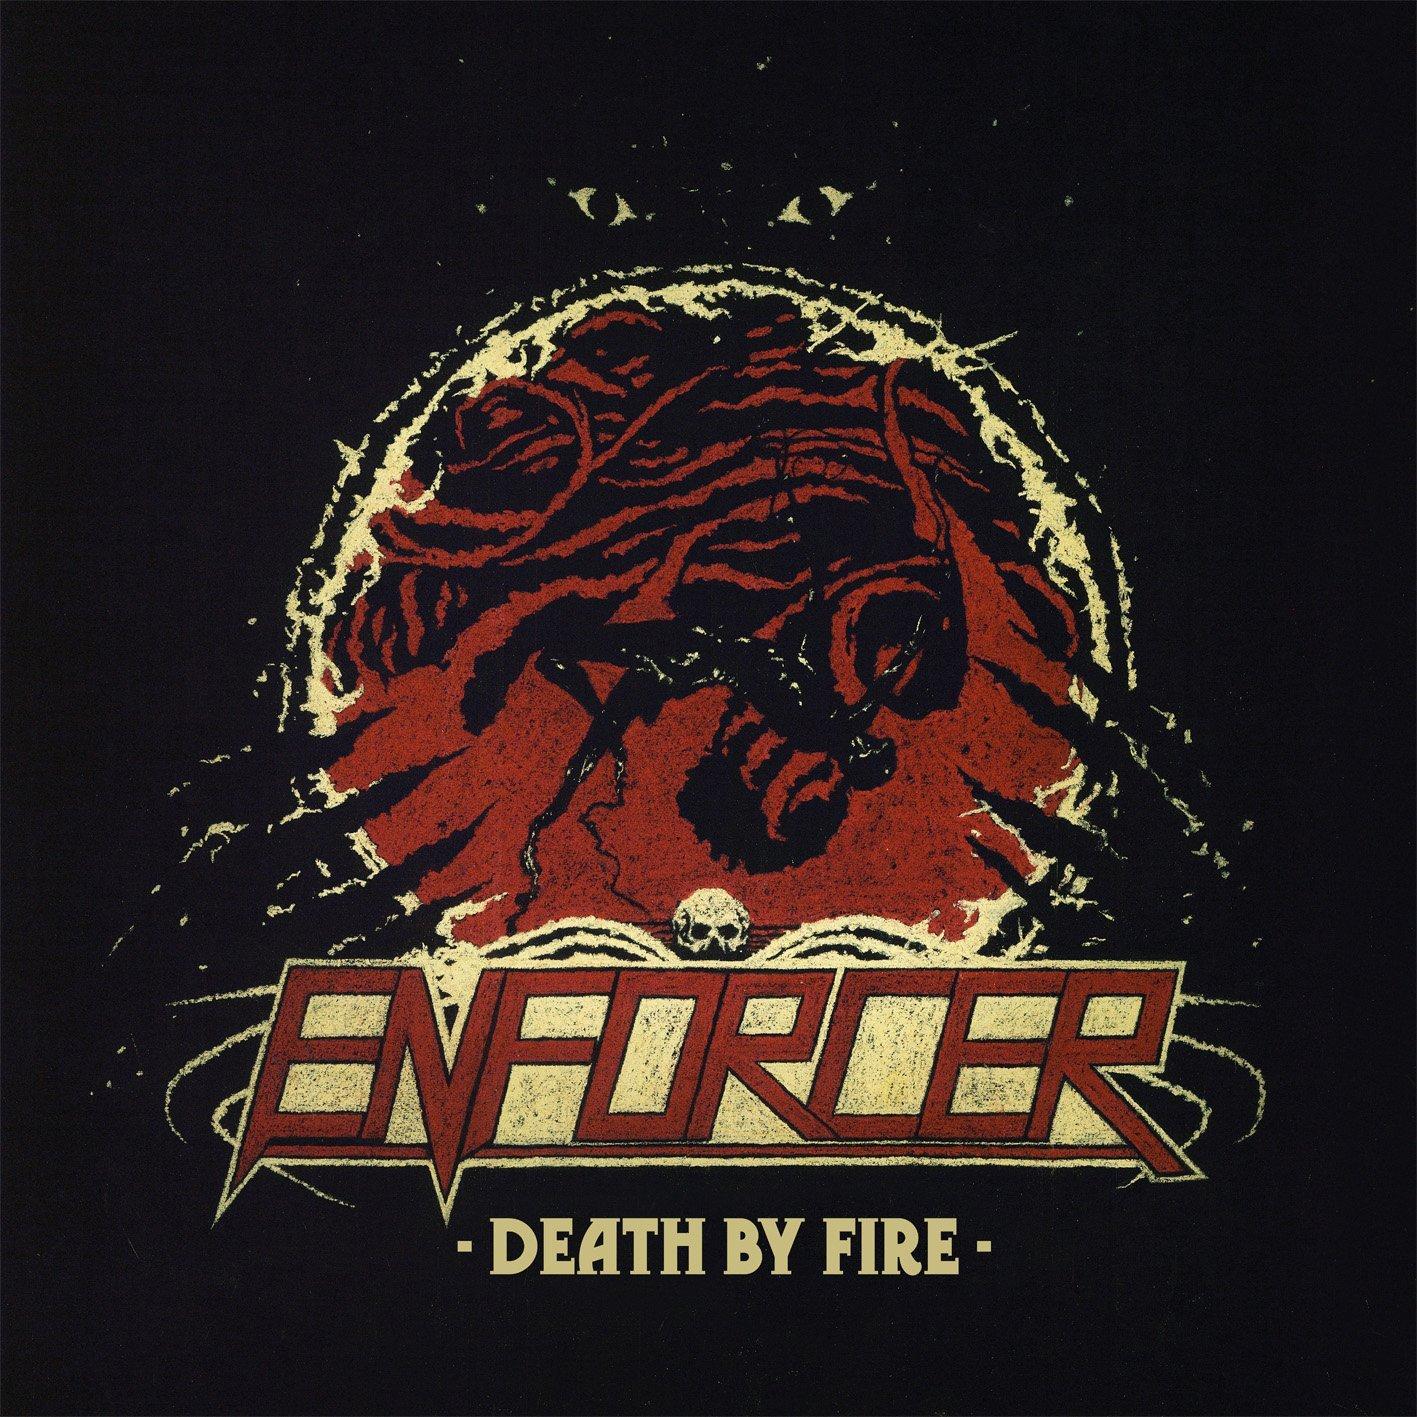 CD : Enforcer - Death By Fire (CD)